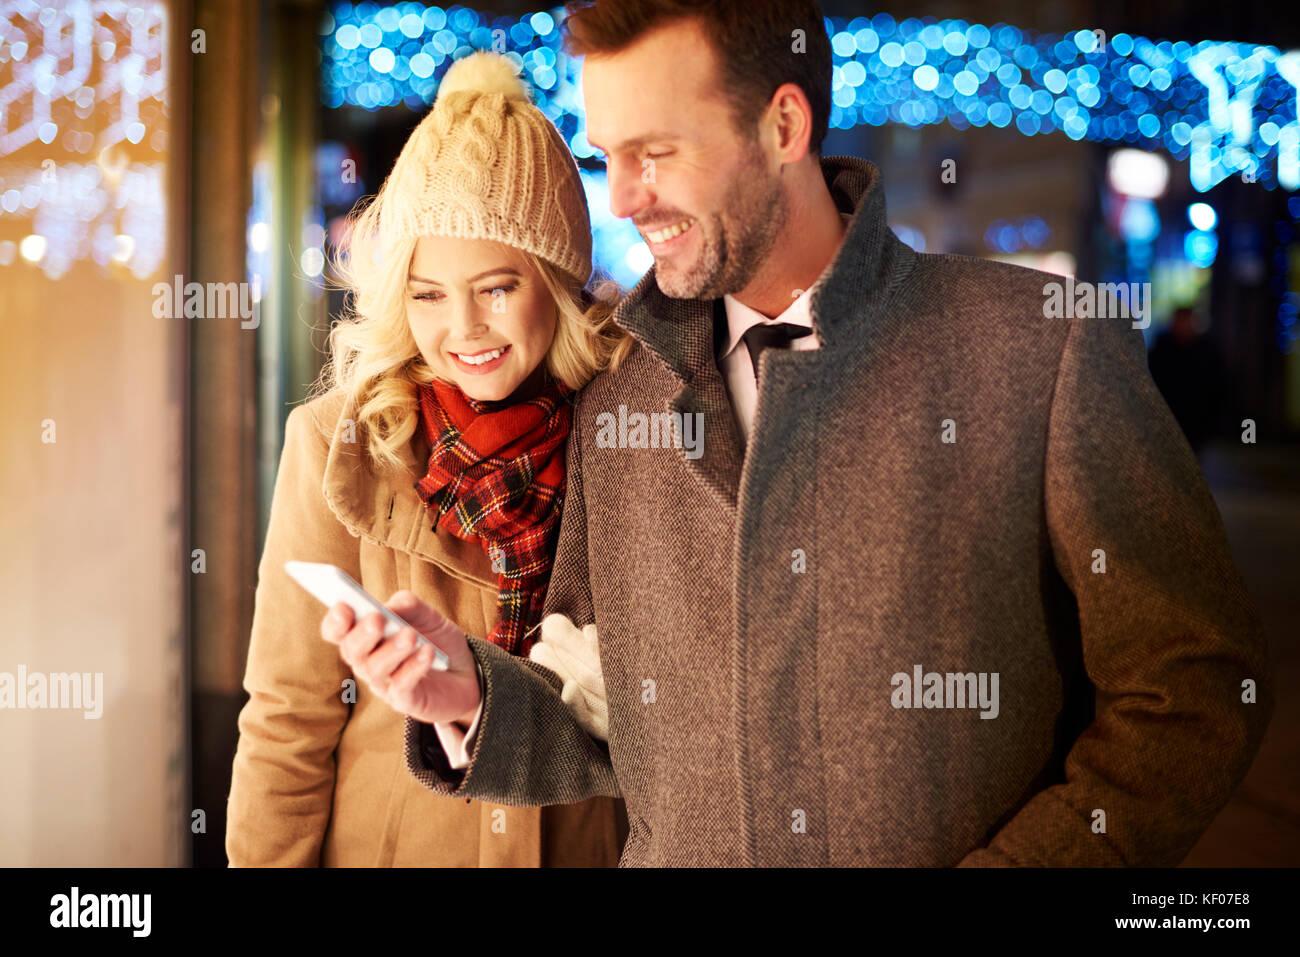 Waist up of couple using phone outdoors - Stock Image